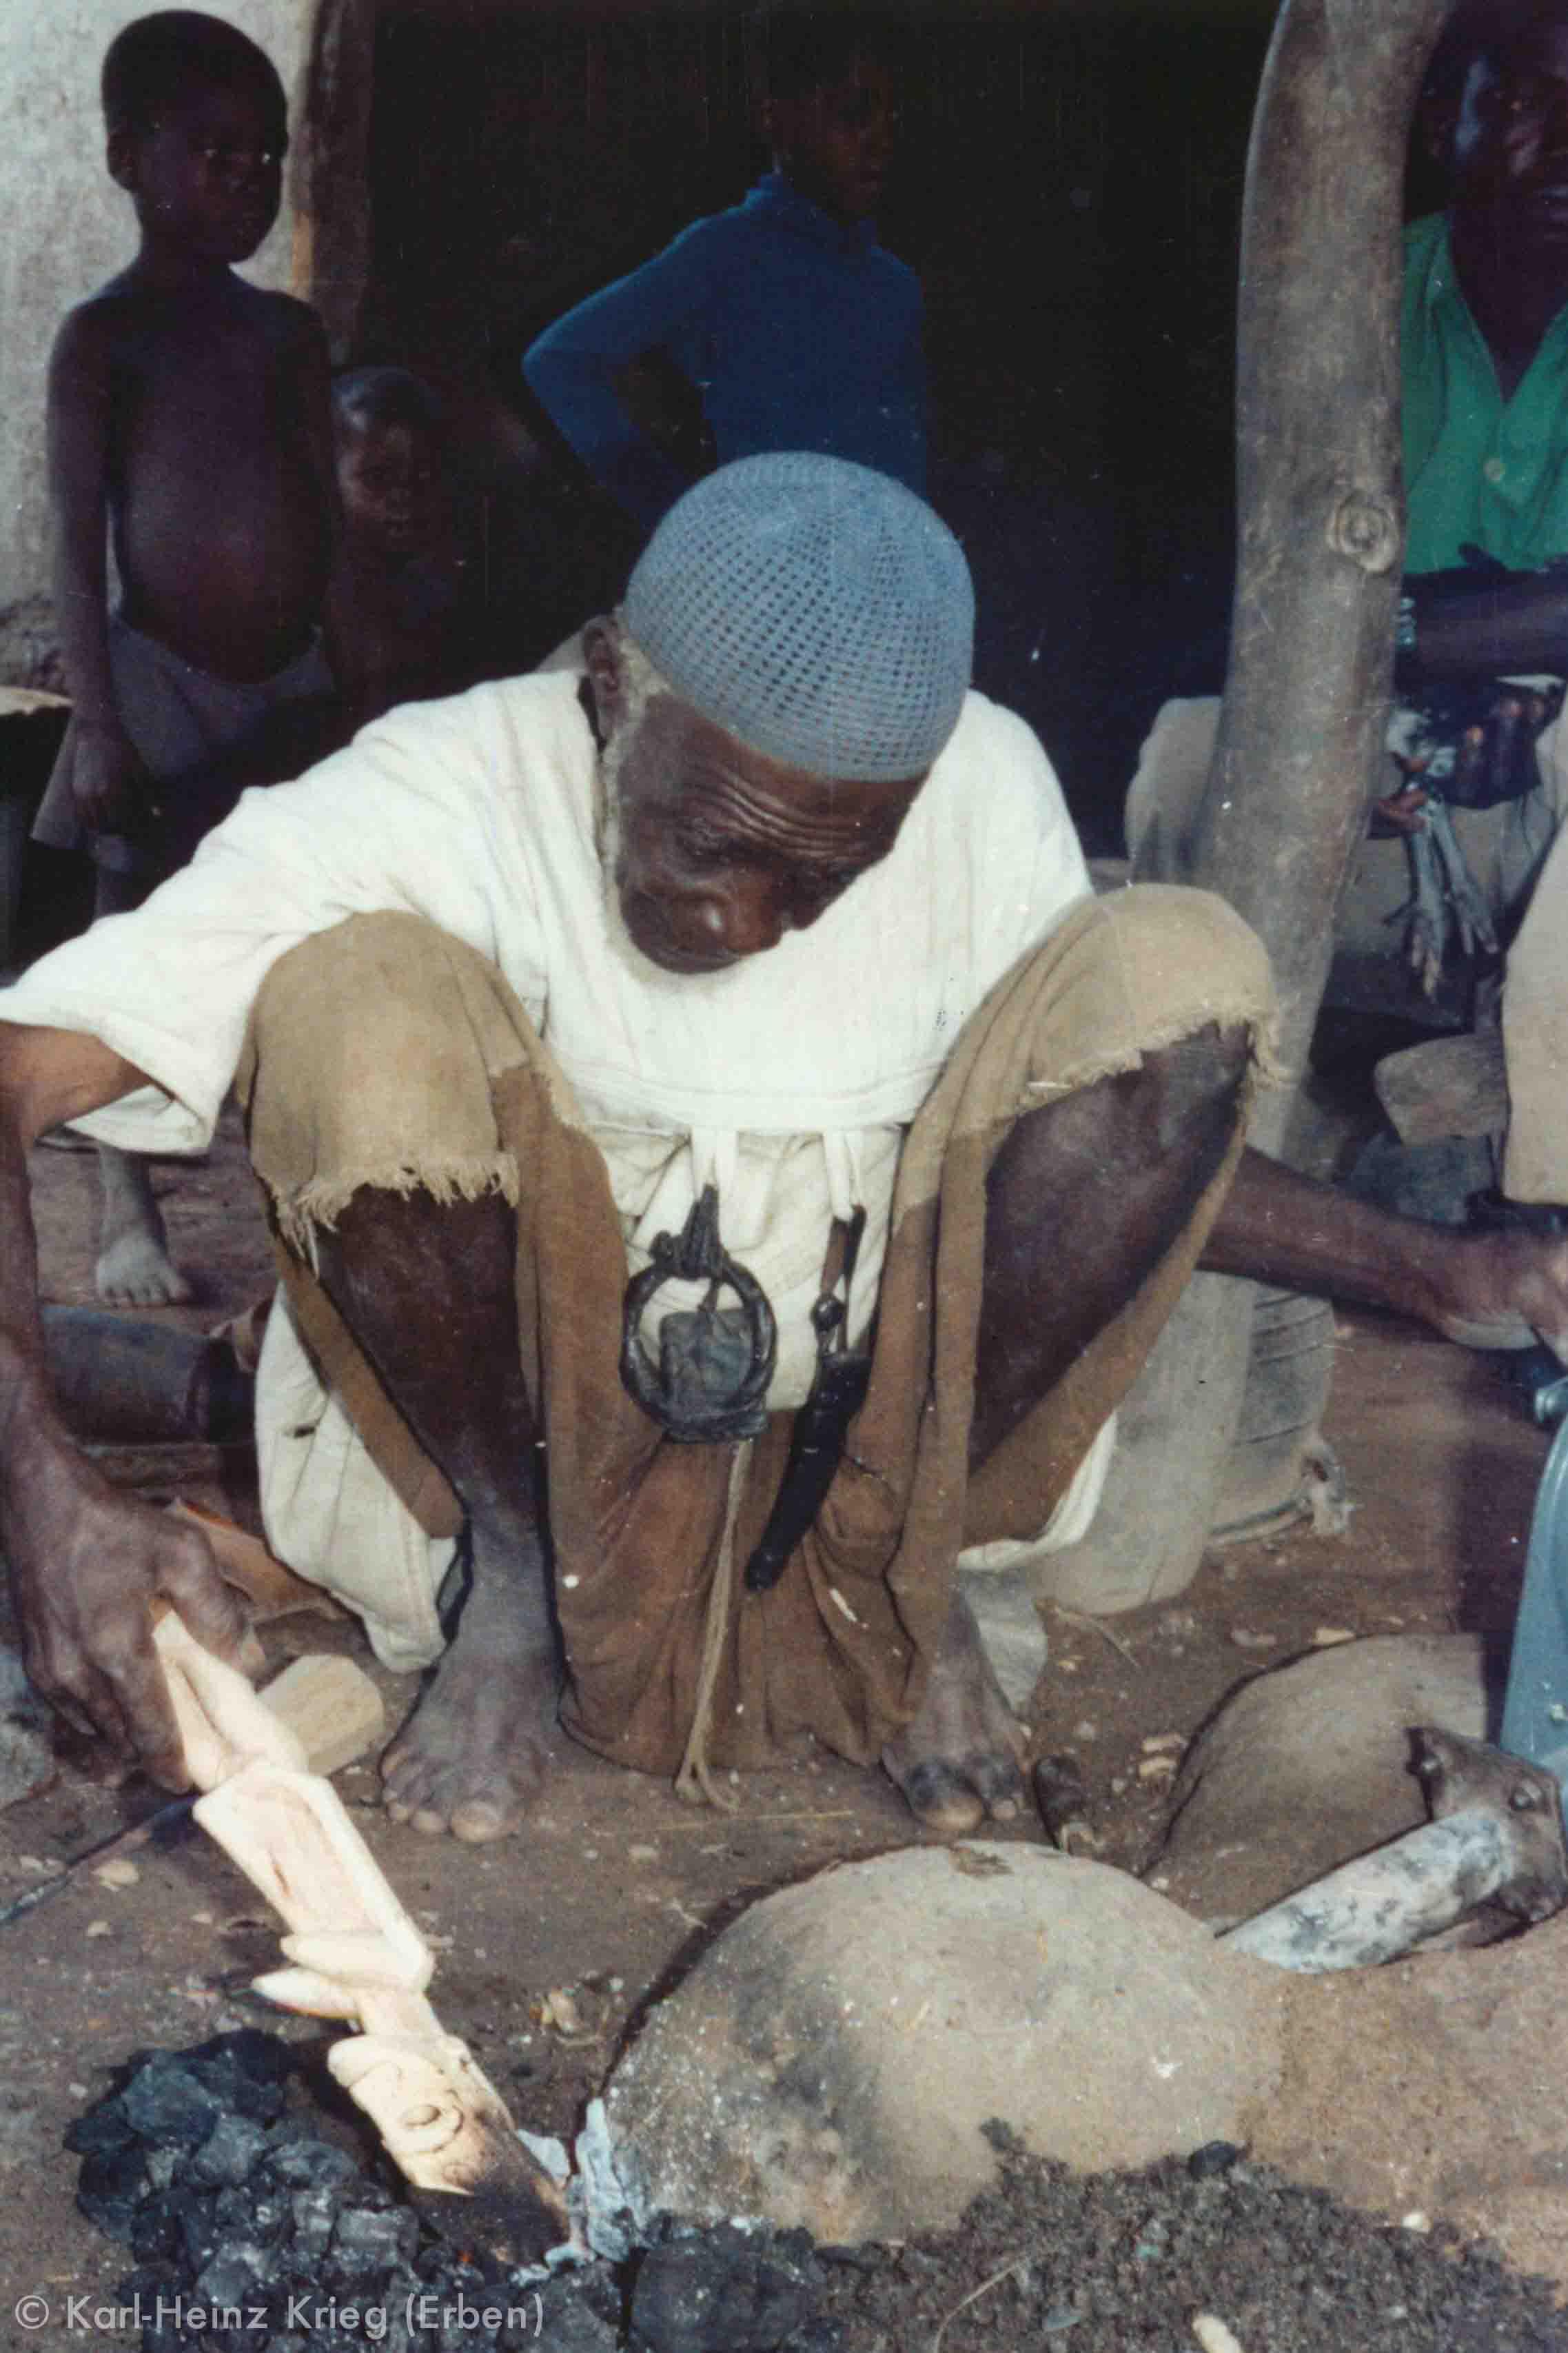 Tinnin Fané blackens the carved figure on an open fire at the forge. Photo: Karl-Heinz Krieg, Fakola (Mali), 1981